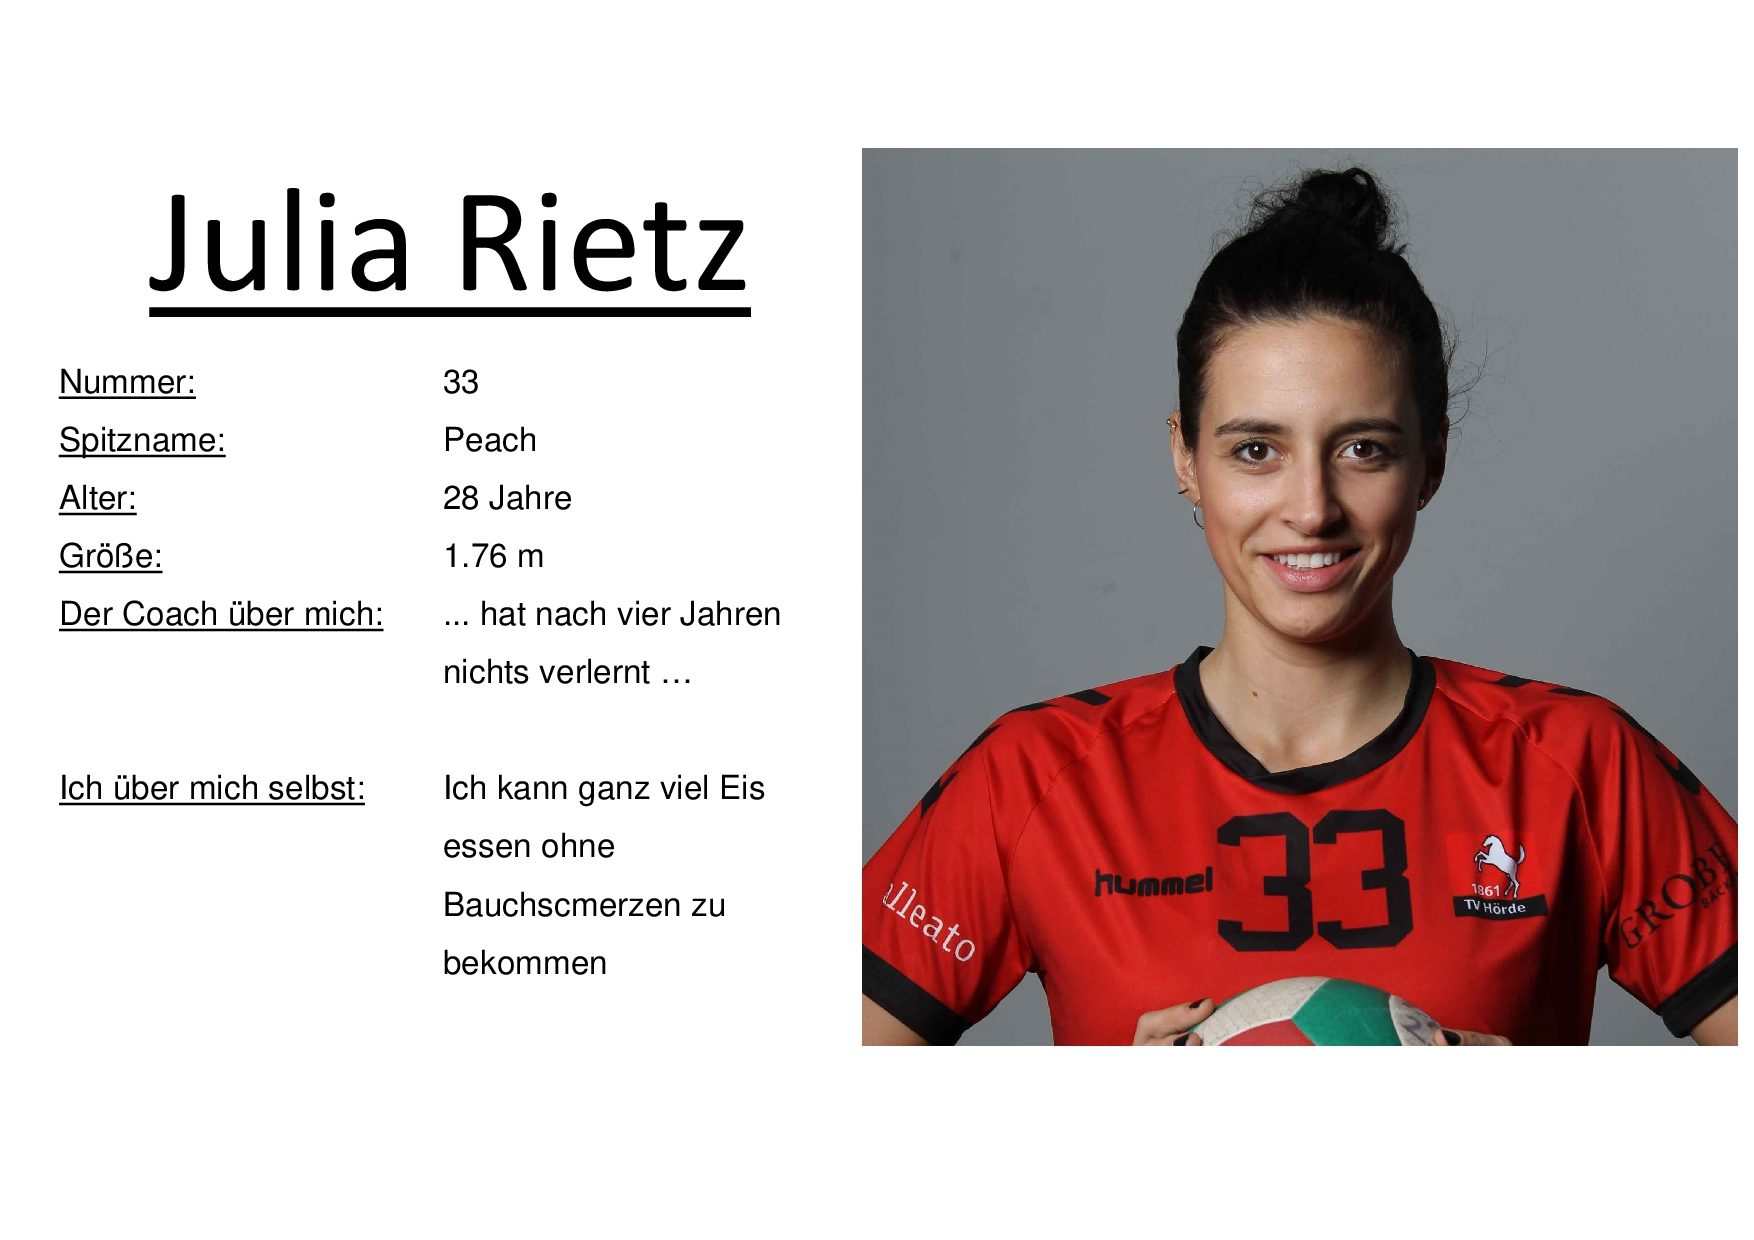 Julia Rietz